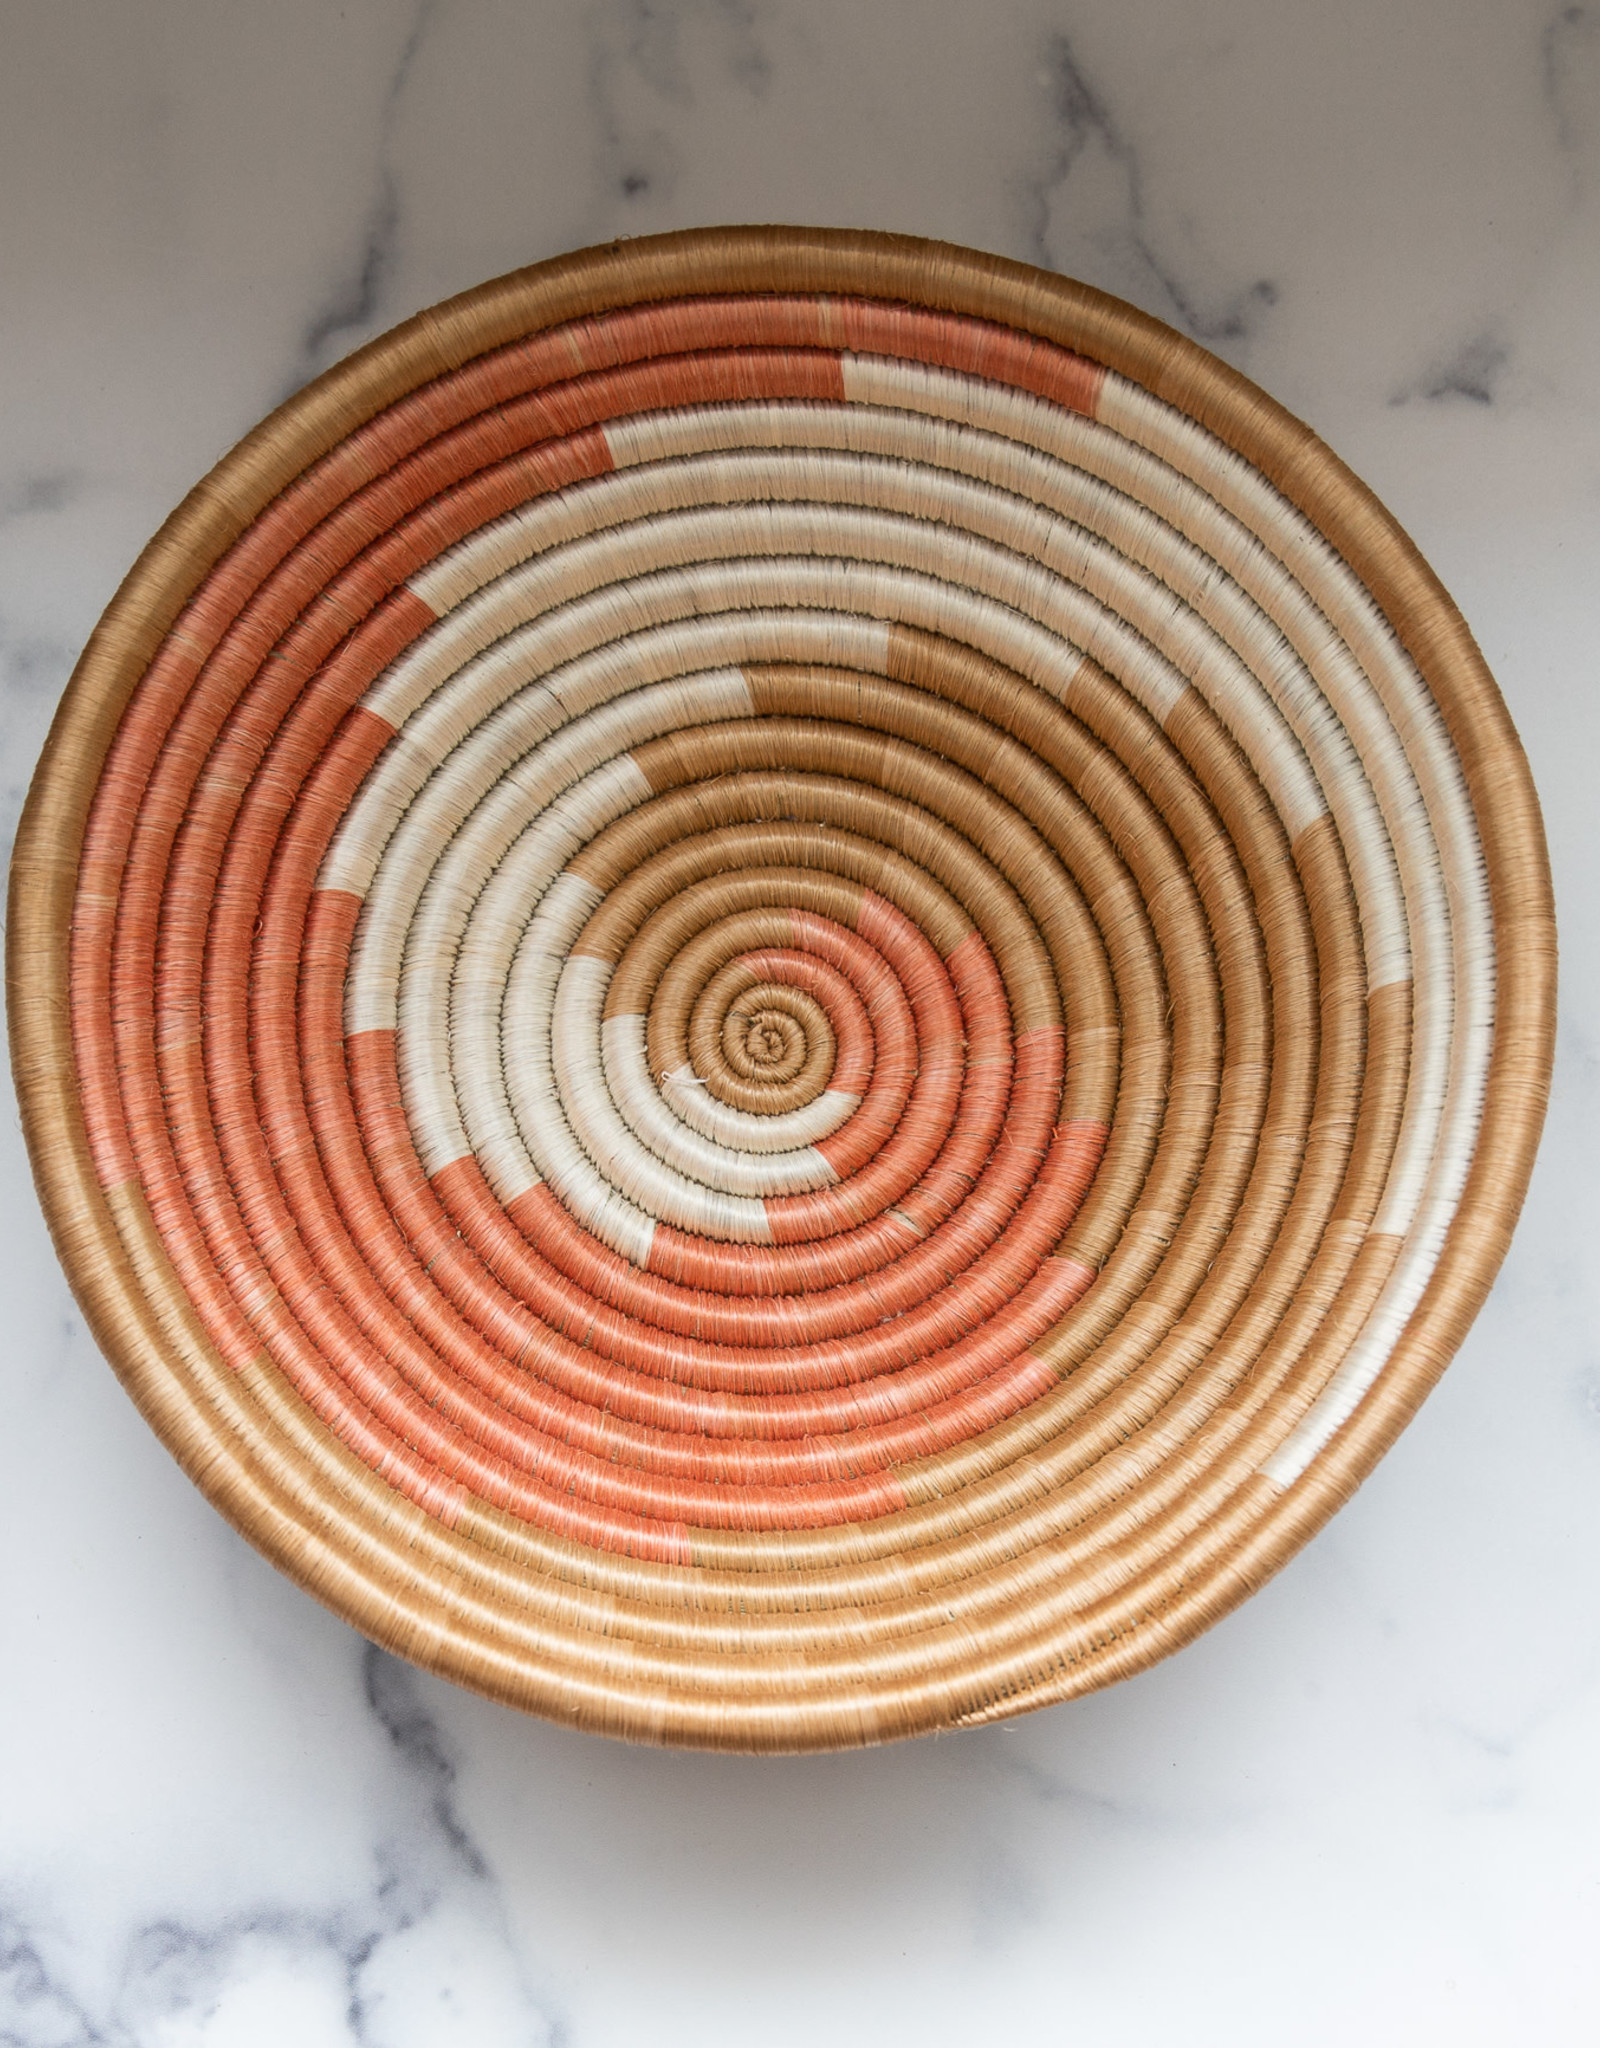 Handmade in Kenya - 12 Inch Bowl #3